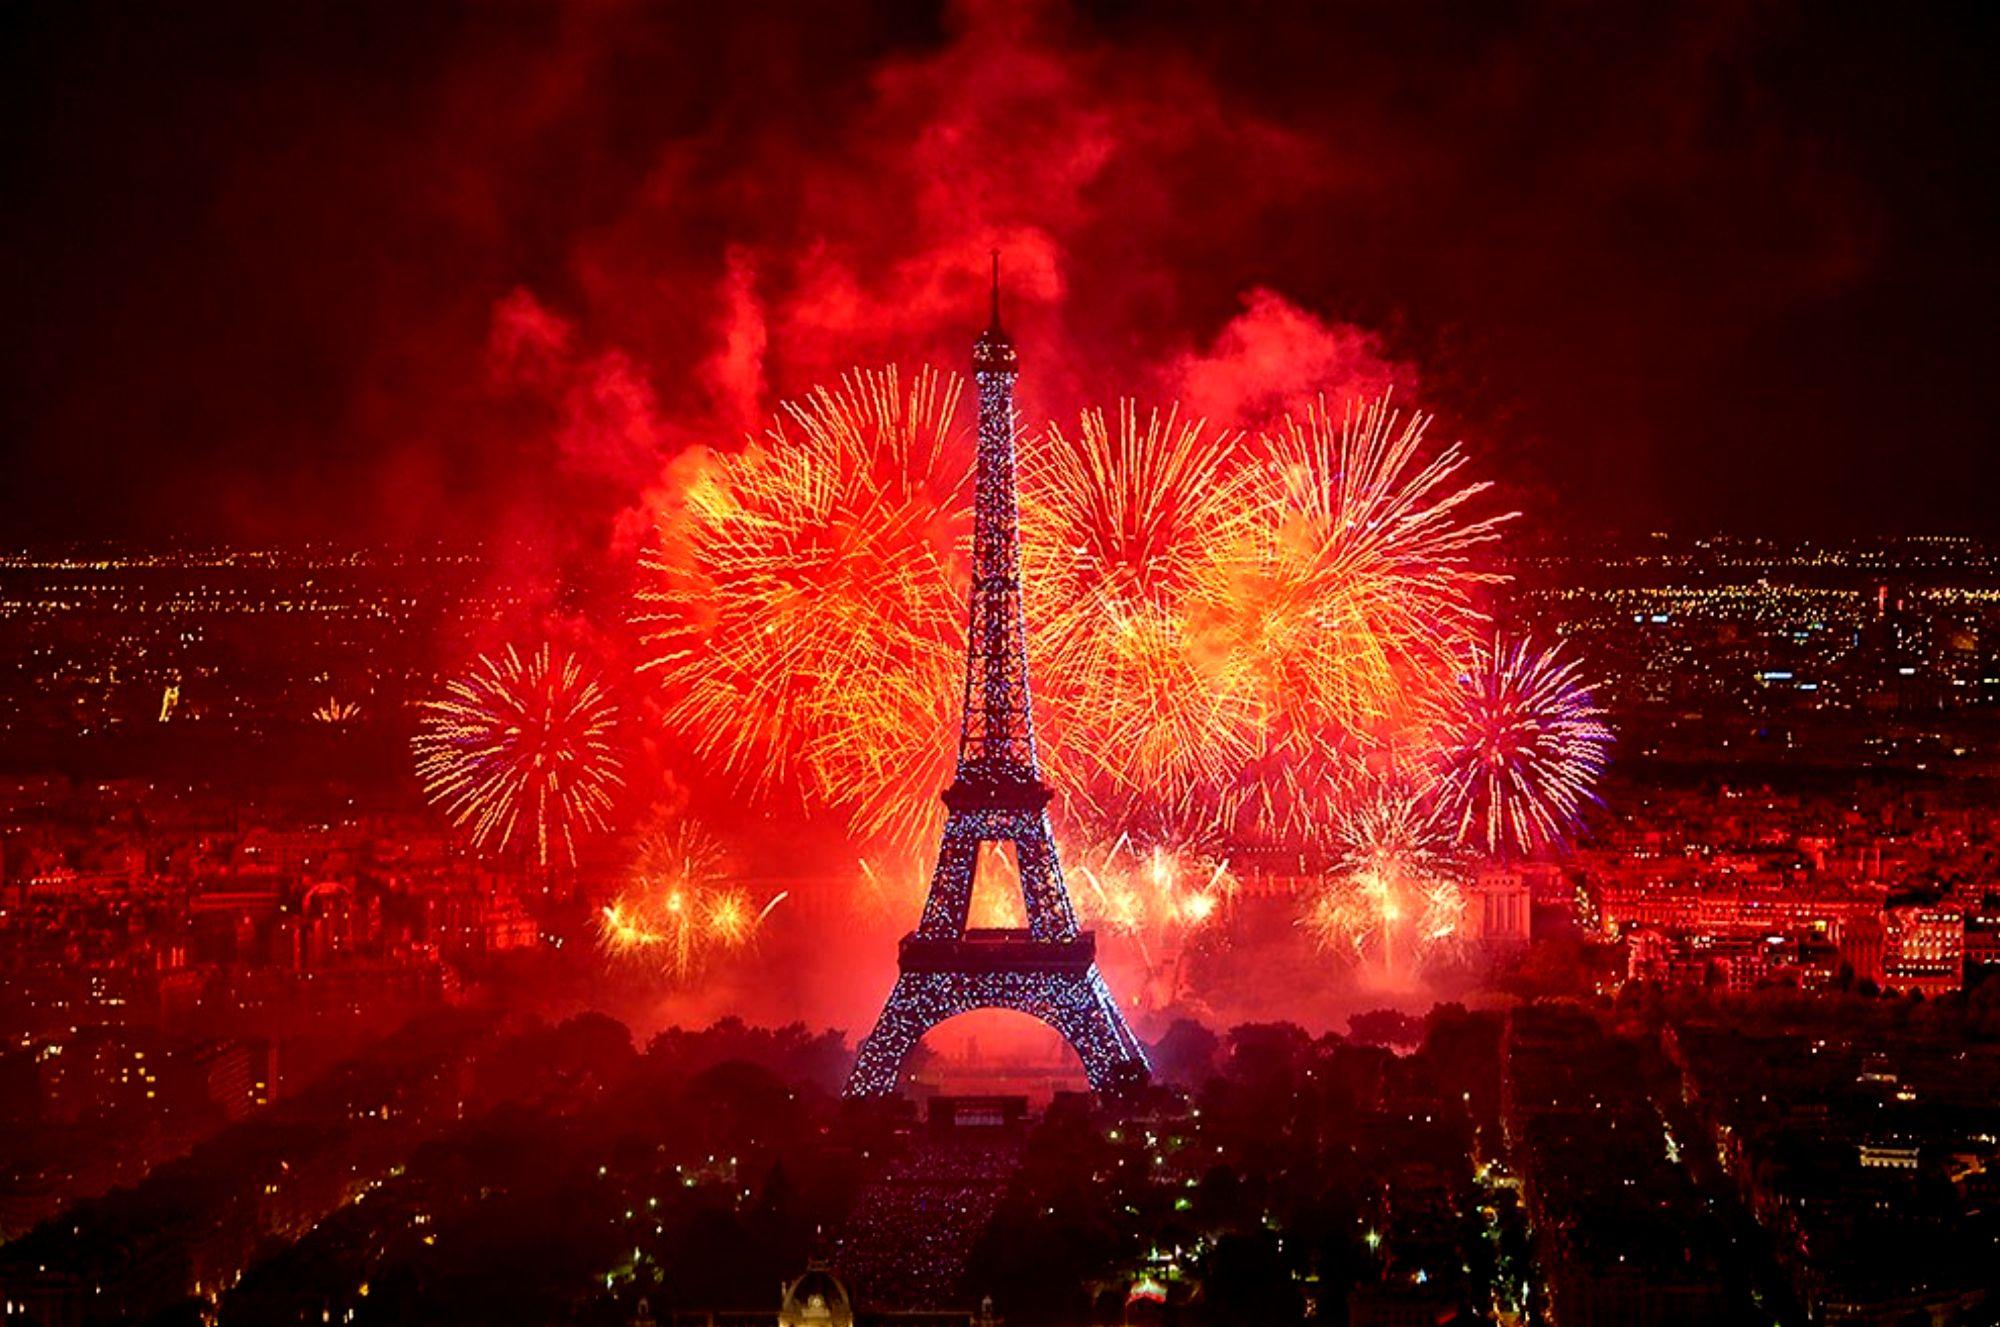 Fireworks Computer Wallpapers Desktop Backgrounds 2000x1327 ID 2000x1327